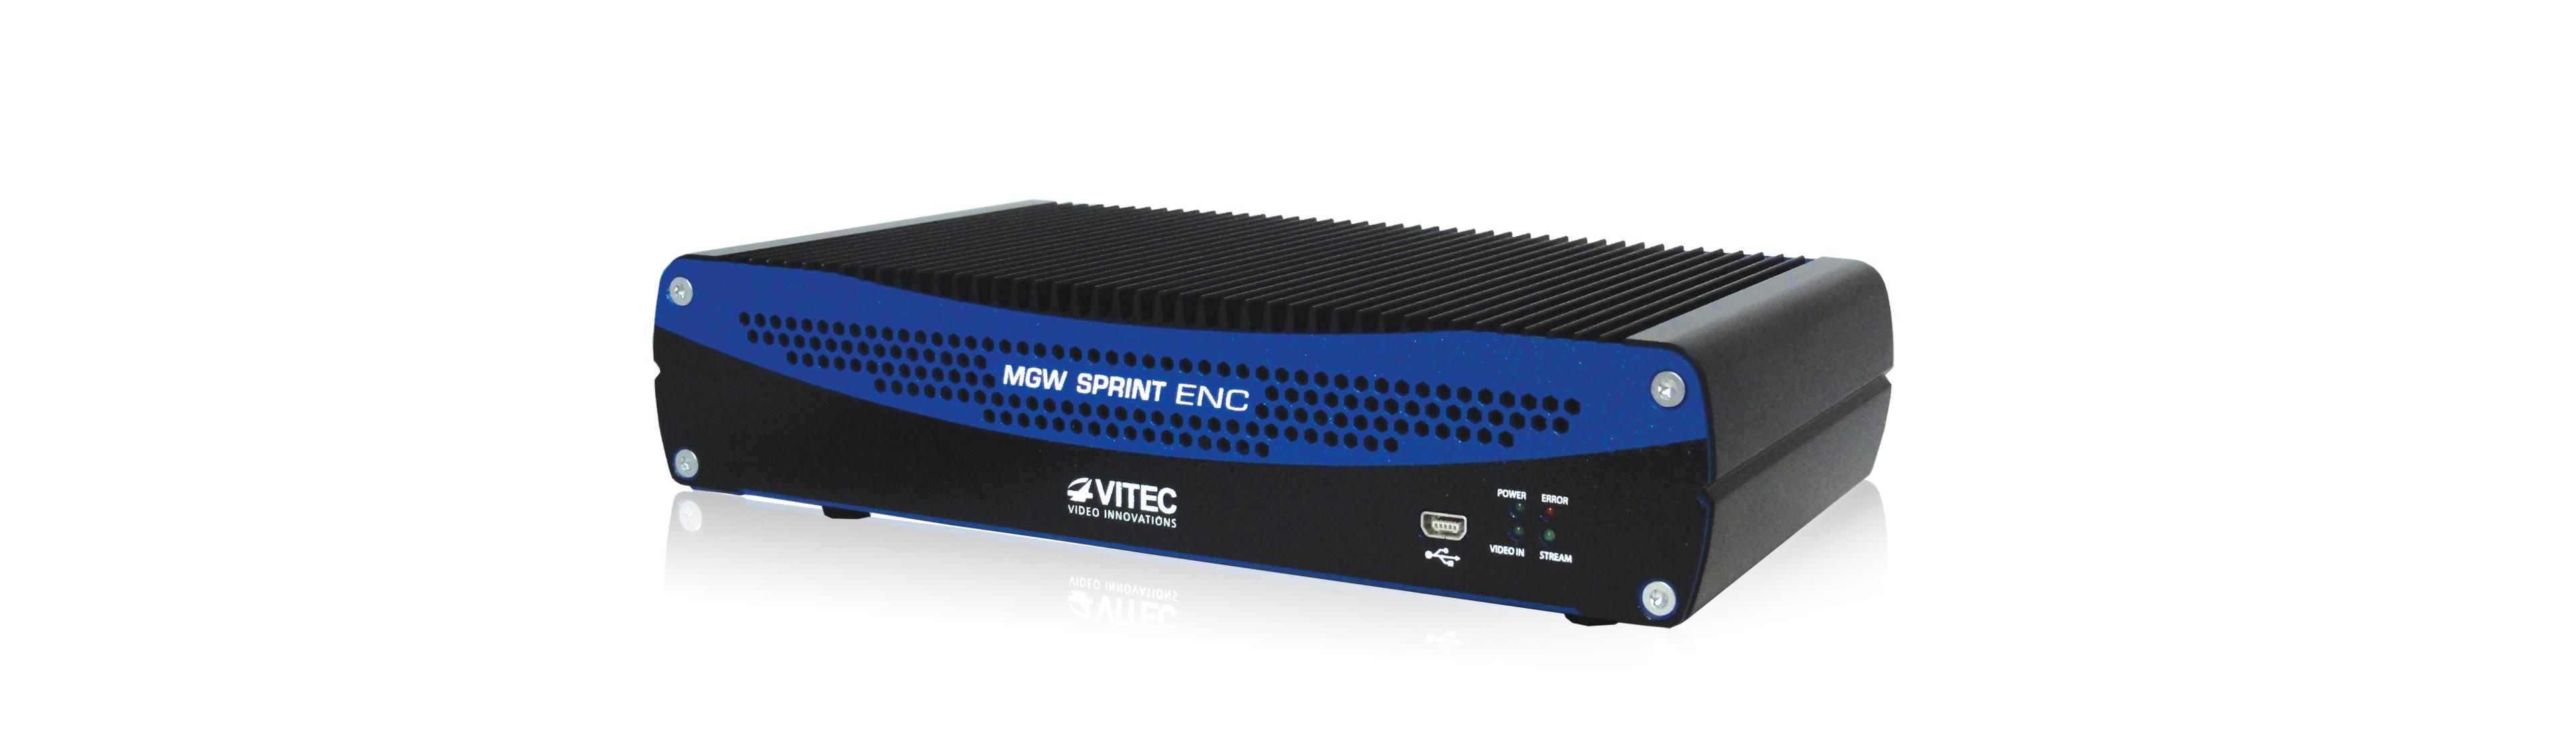 VITEC - MGW Sprint - Sub One-Frame H 264 HD IPTV Encoder